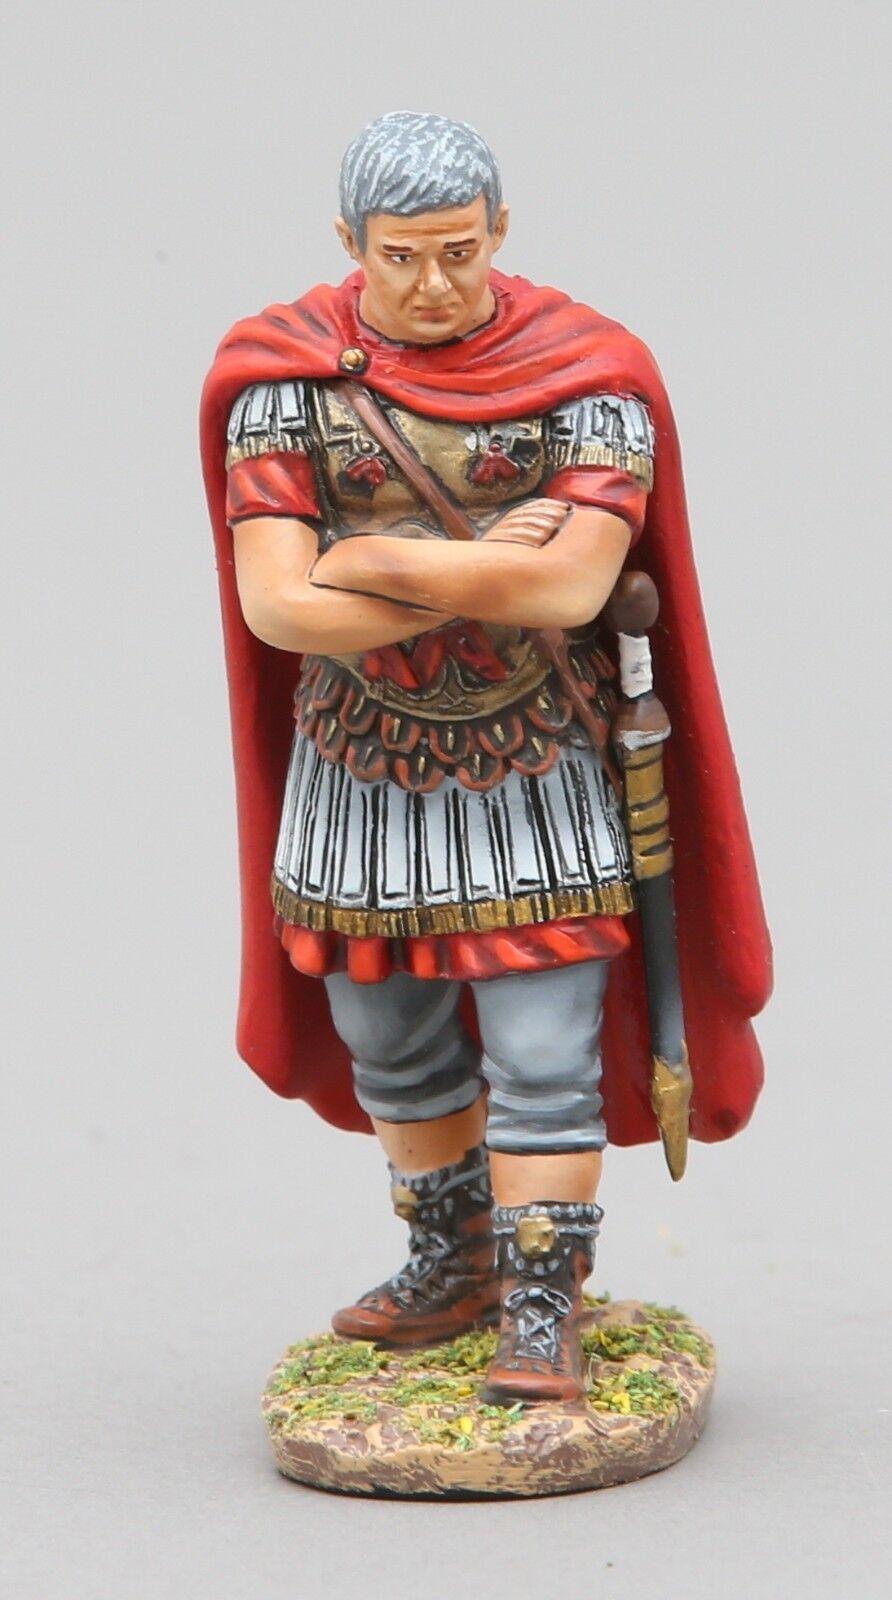 Thomas Gunn Roman Empire ROM081-2 Roman Tribune MIB